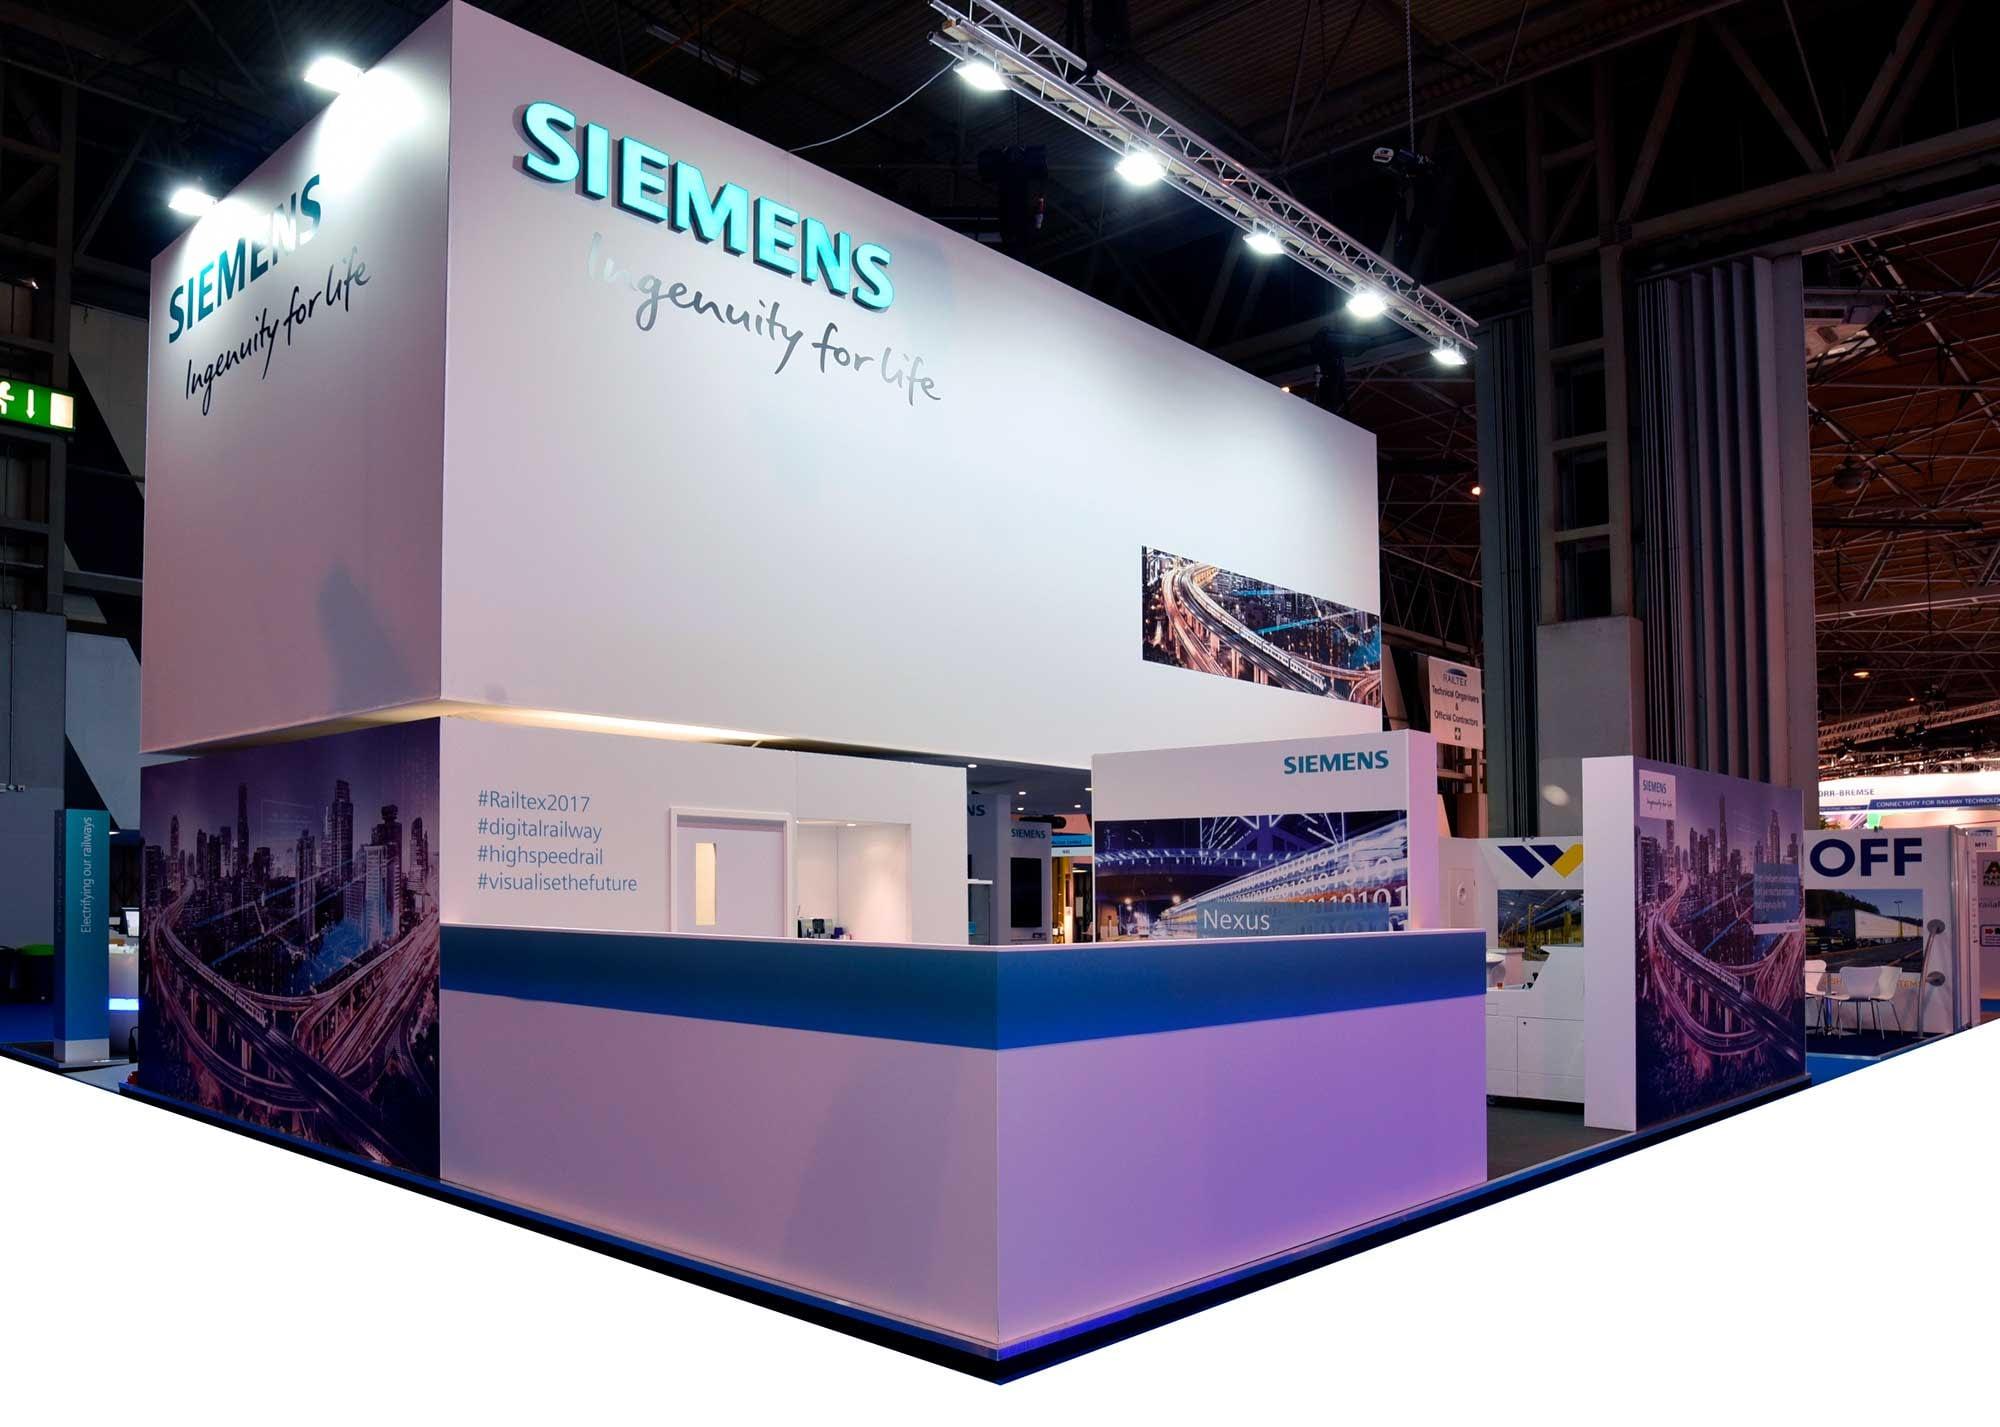 Siemens, Railtex